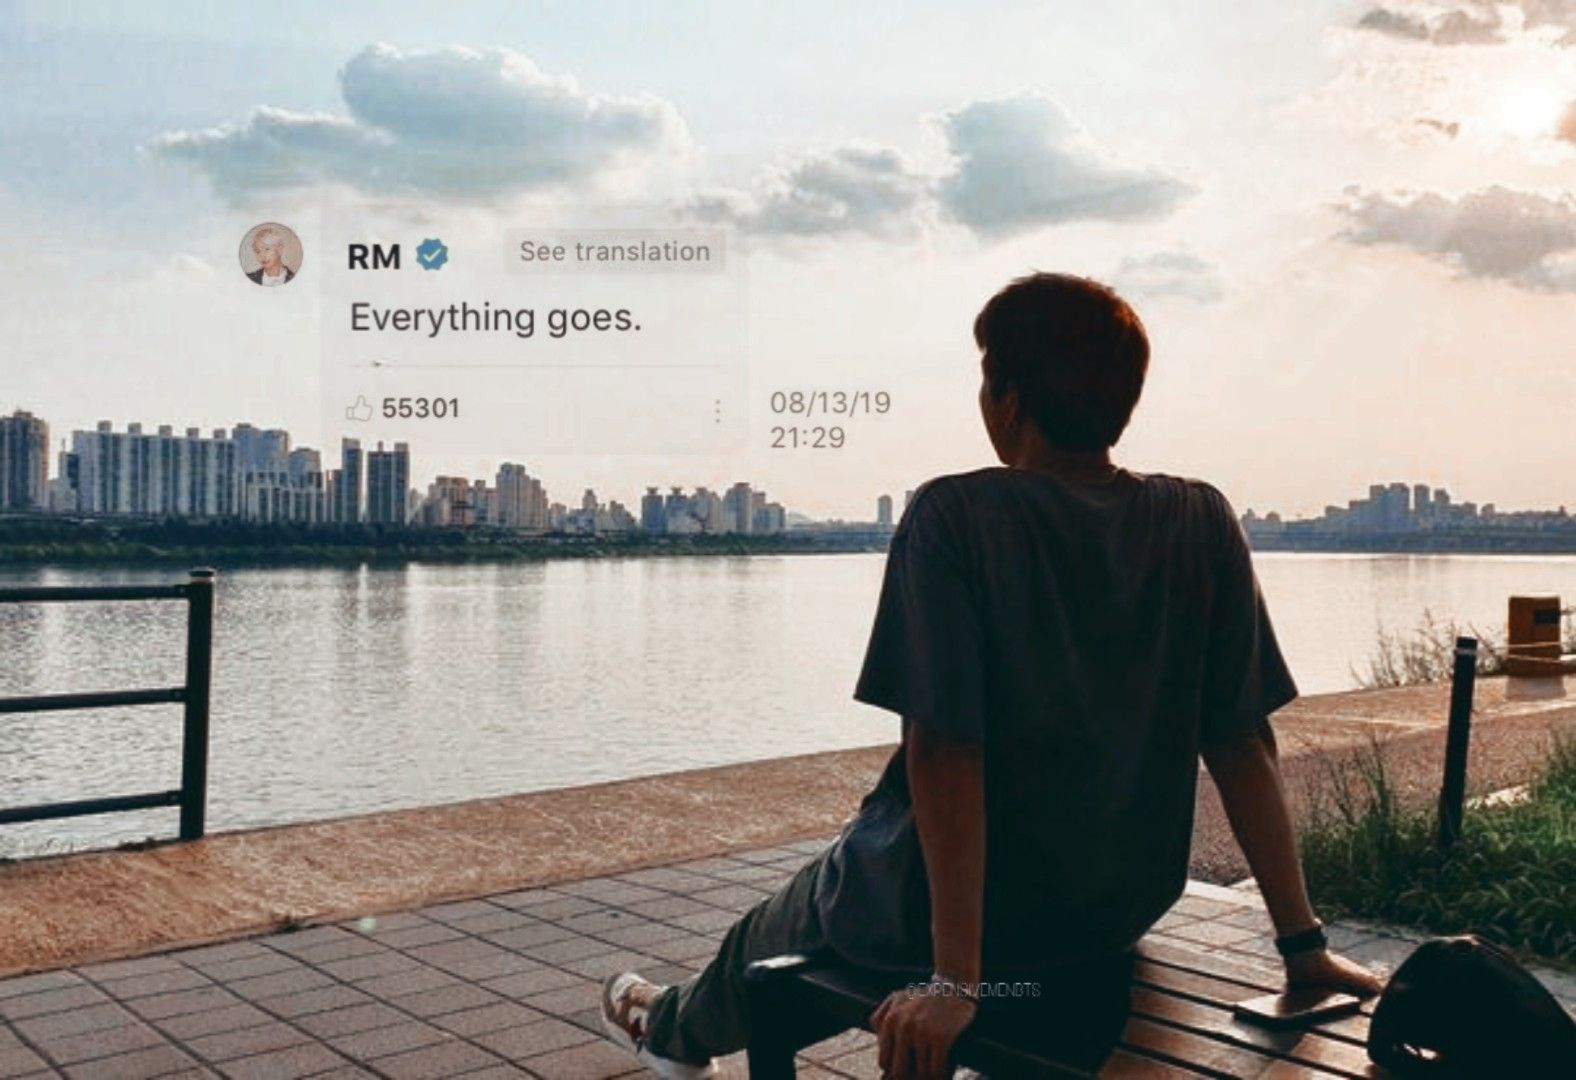 Bts Official On Twitter In 2021 Bts Wallpaper Lyrics Bts Quotes Bts Laptop Wallpaper Bts quotes wallpaper for laptop